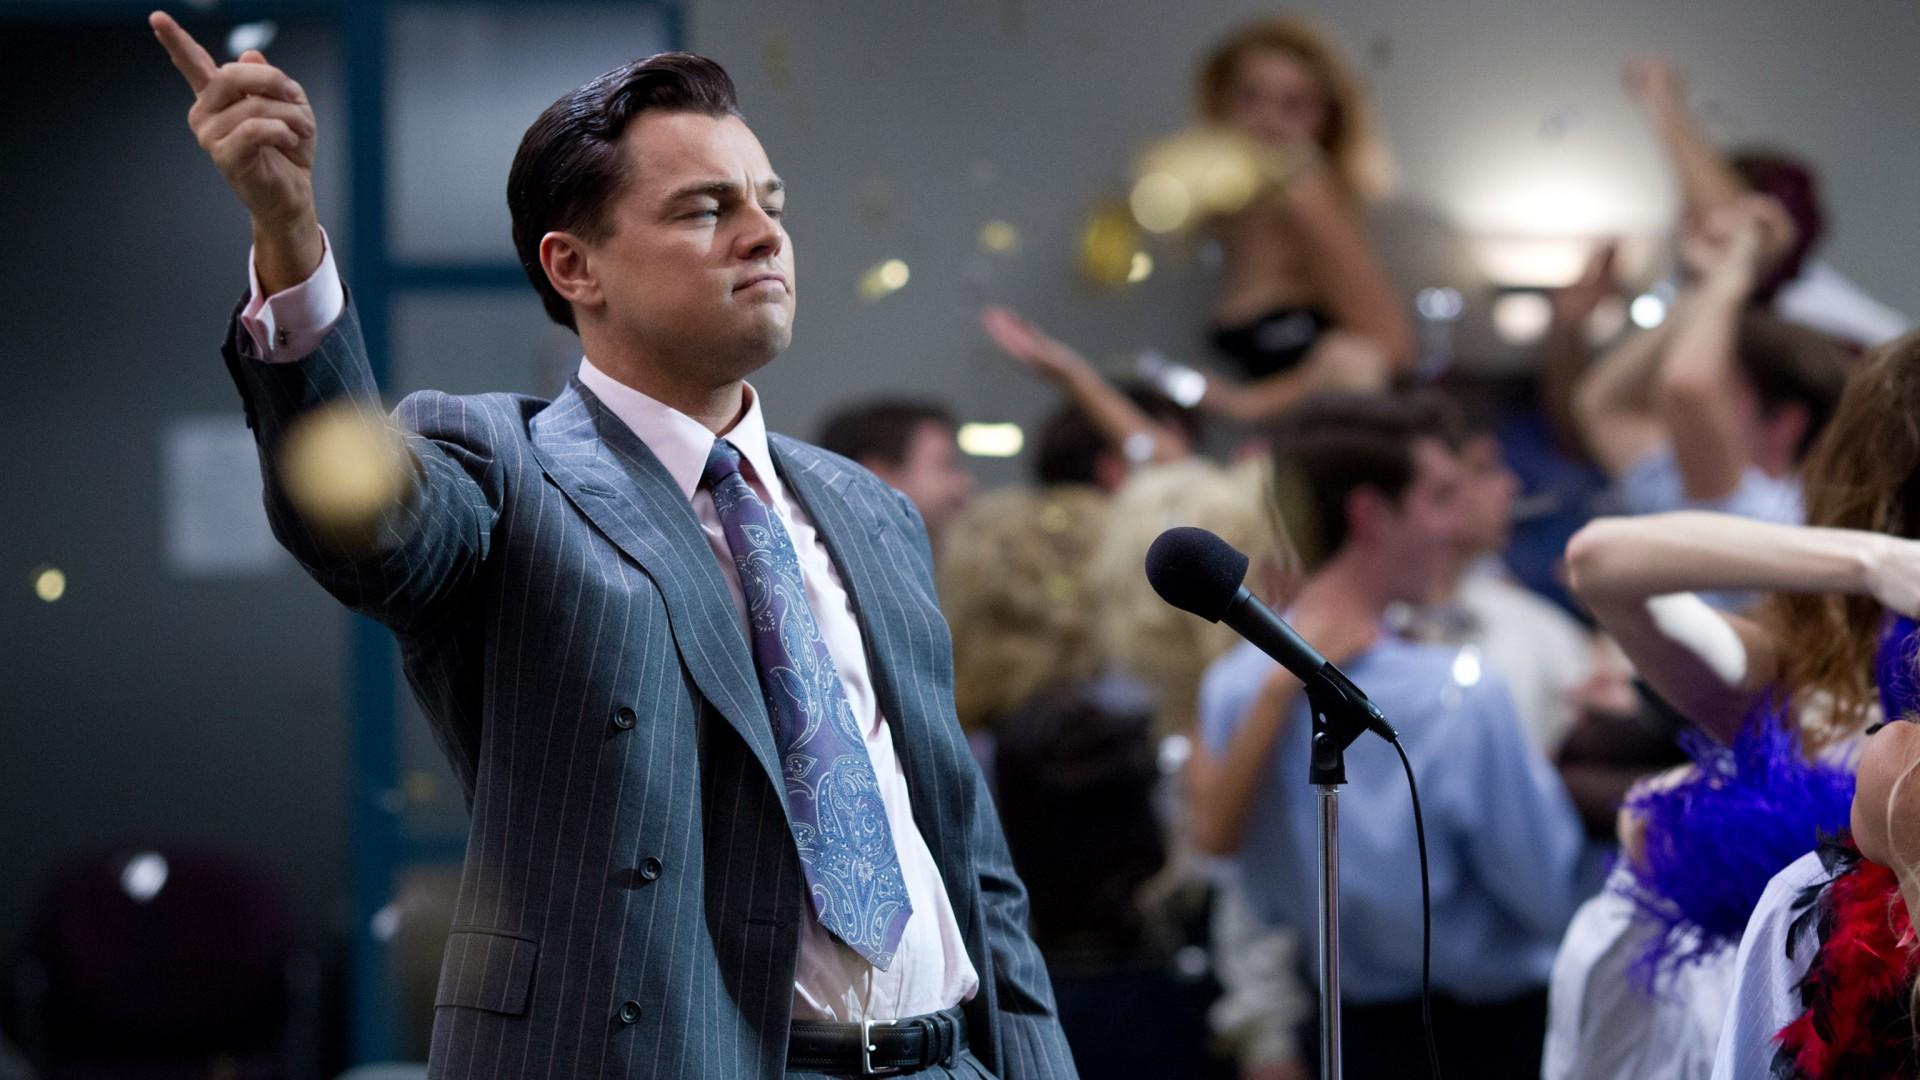 de martin scorcese dans lequel leonardo di caprio incarne un multimillionnaire g0e9nie de la wall street multipliant